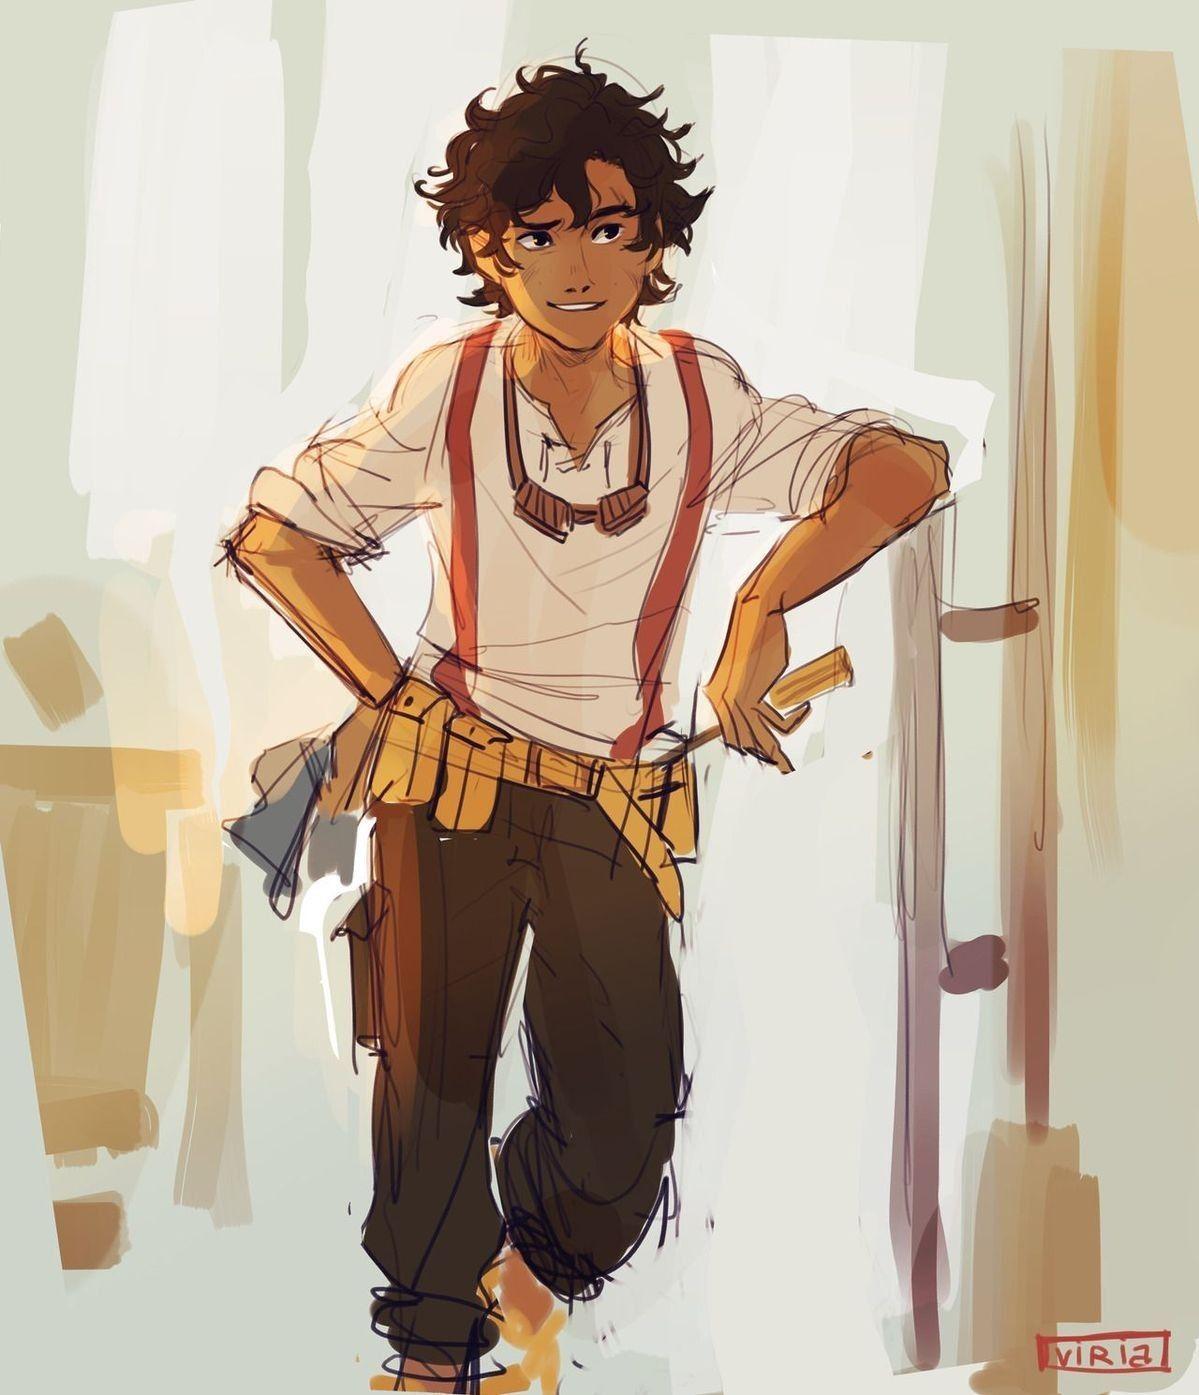 Heroes of Olympus Fanart, Leo Valdez Fanart, Art by #Viria13 on Twitter, # Leo #LeoValdez | Percy jackson art, Percy jackson characters, Percy jackson